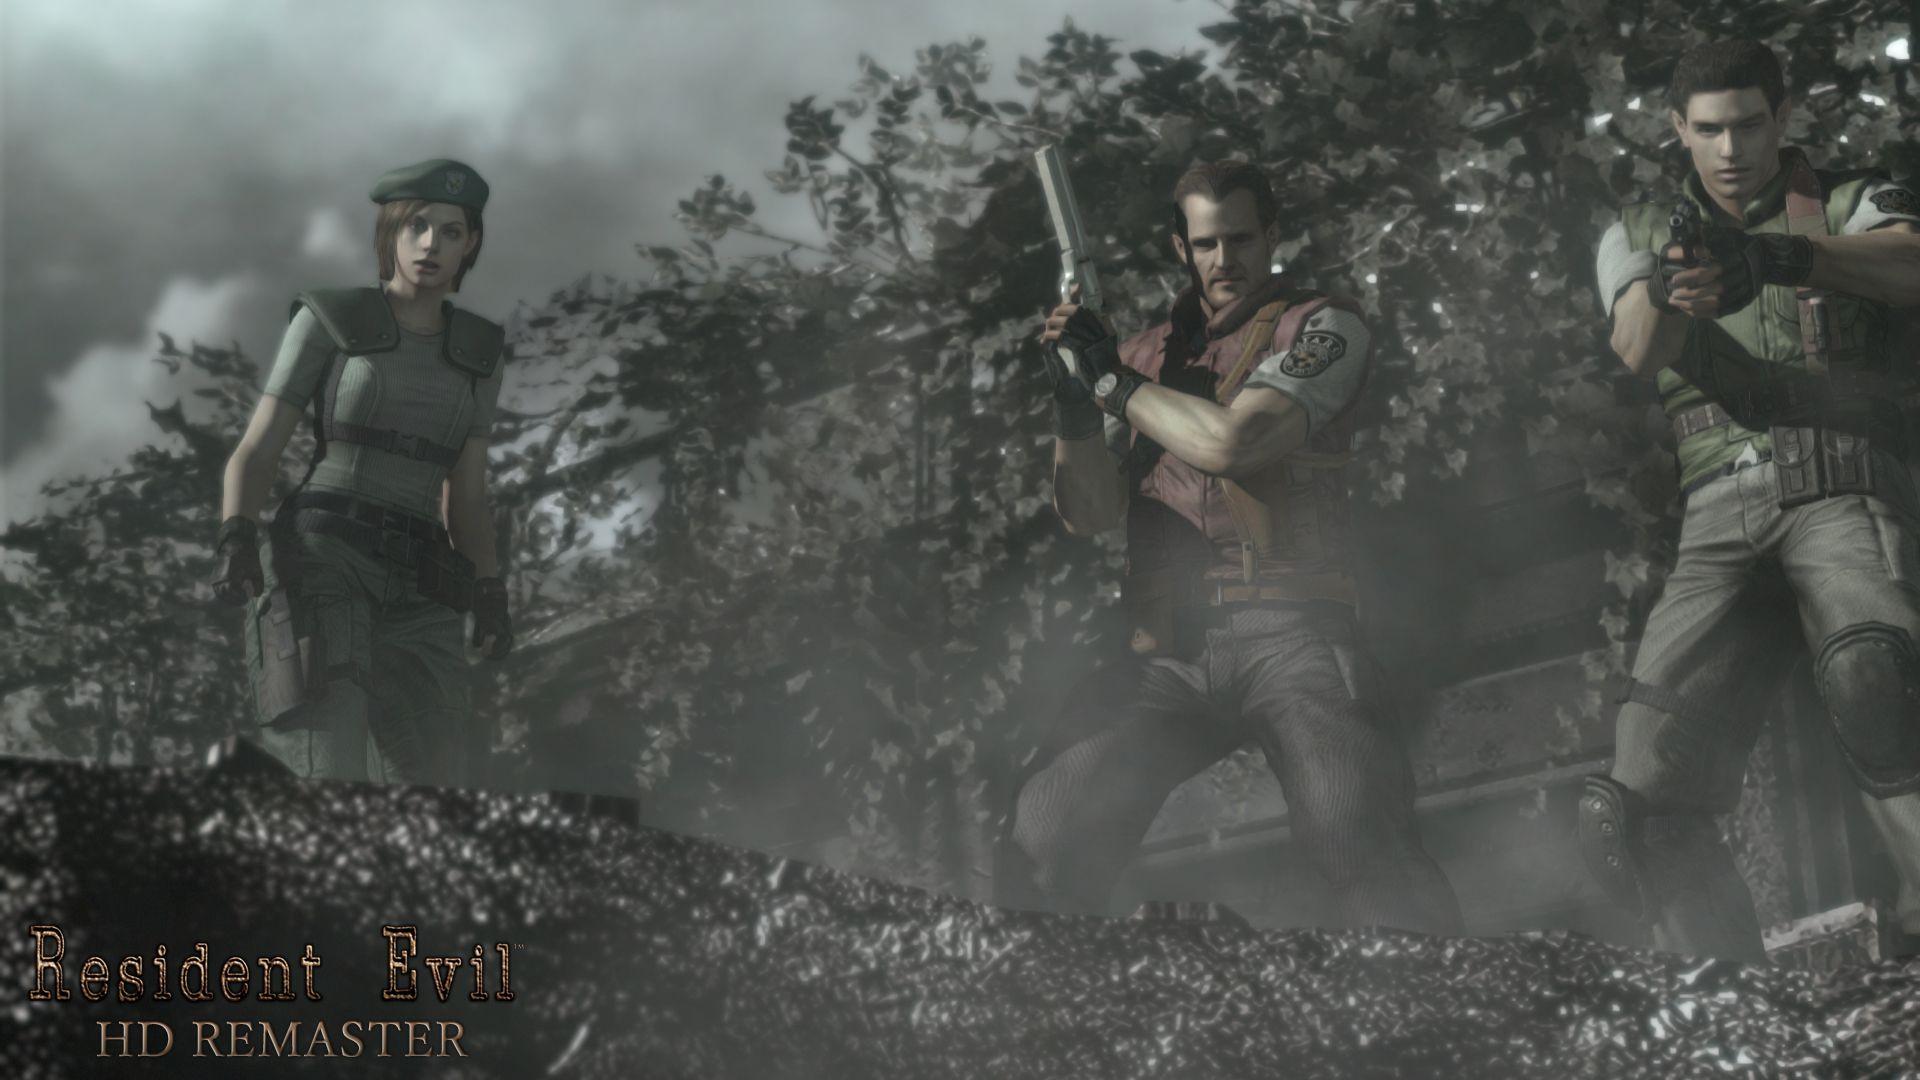 Resident Evil Hd Remaster Wallpapers 1920x1080 Identi Resident Evil Resident Evil Hd Remaster Gaming Wallpapers Hd